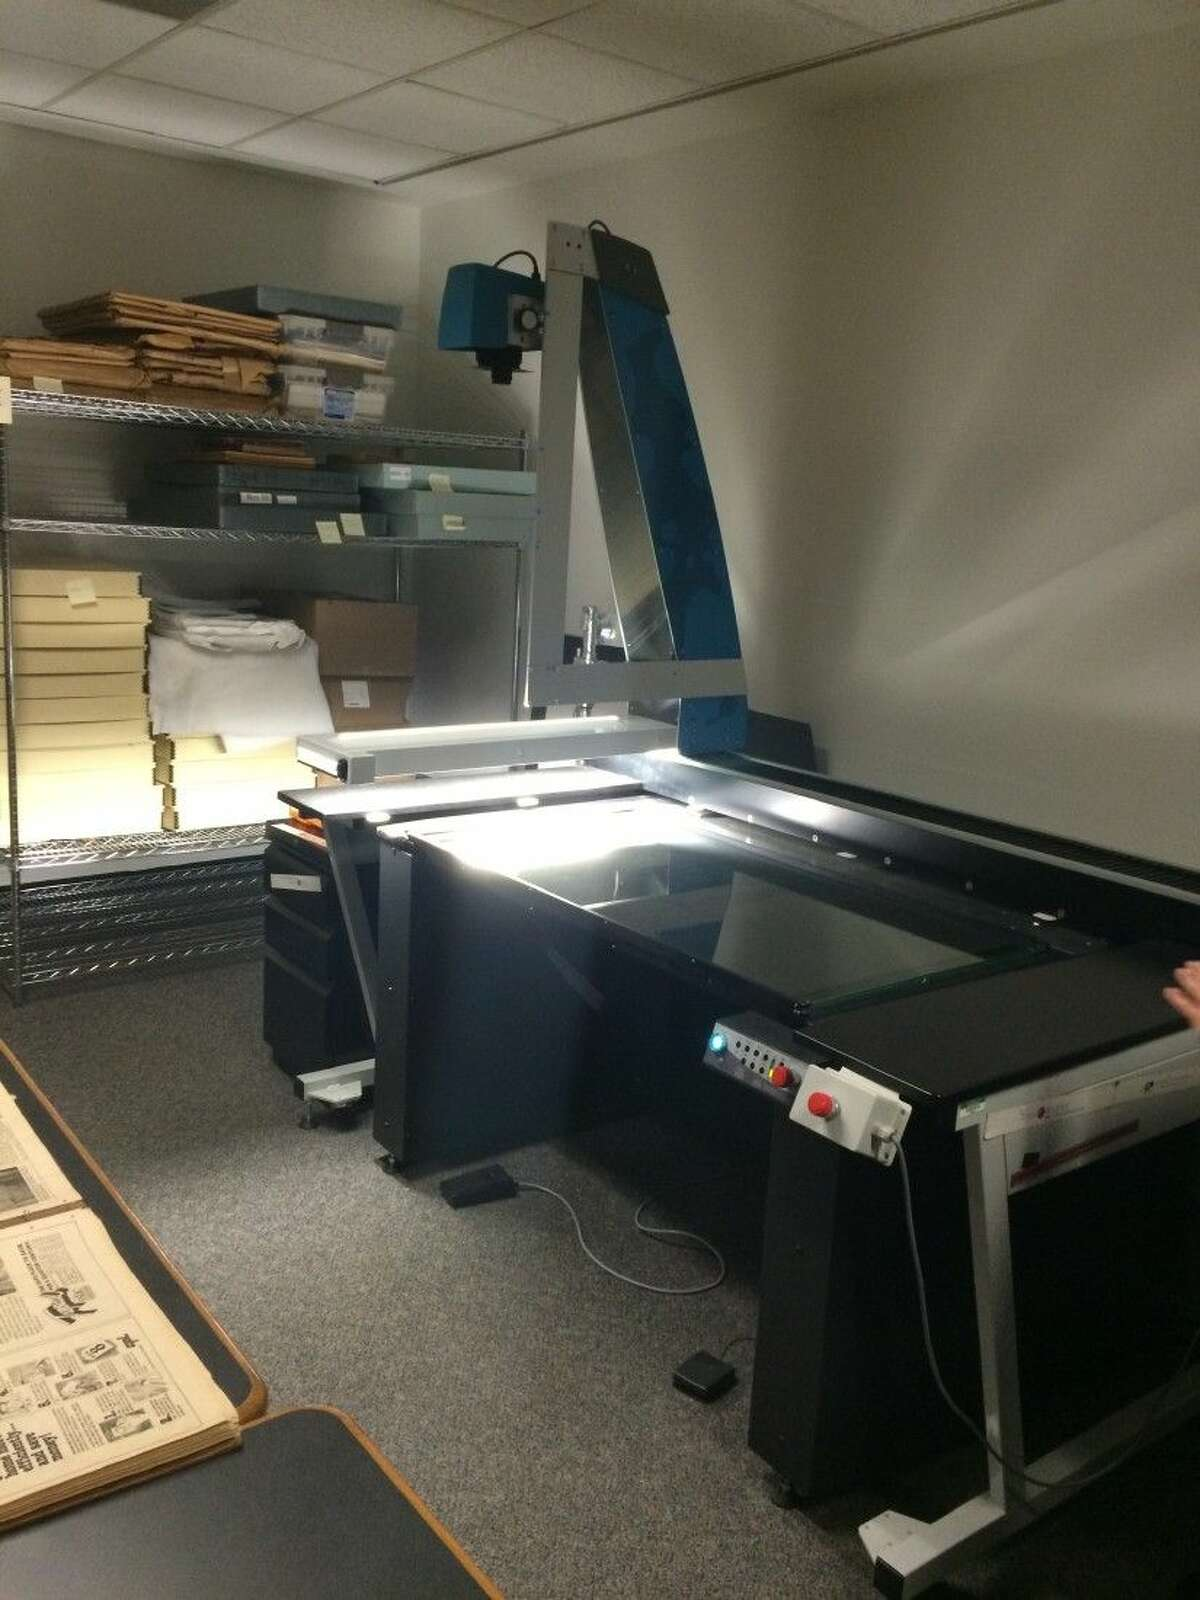 The digitizing machine at University of North Texas.